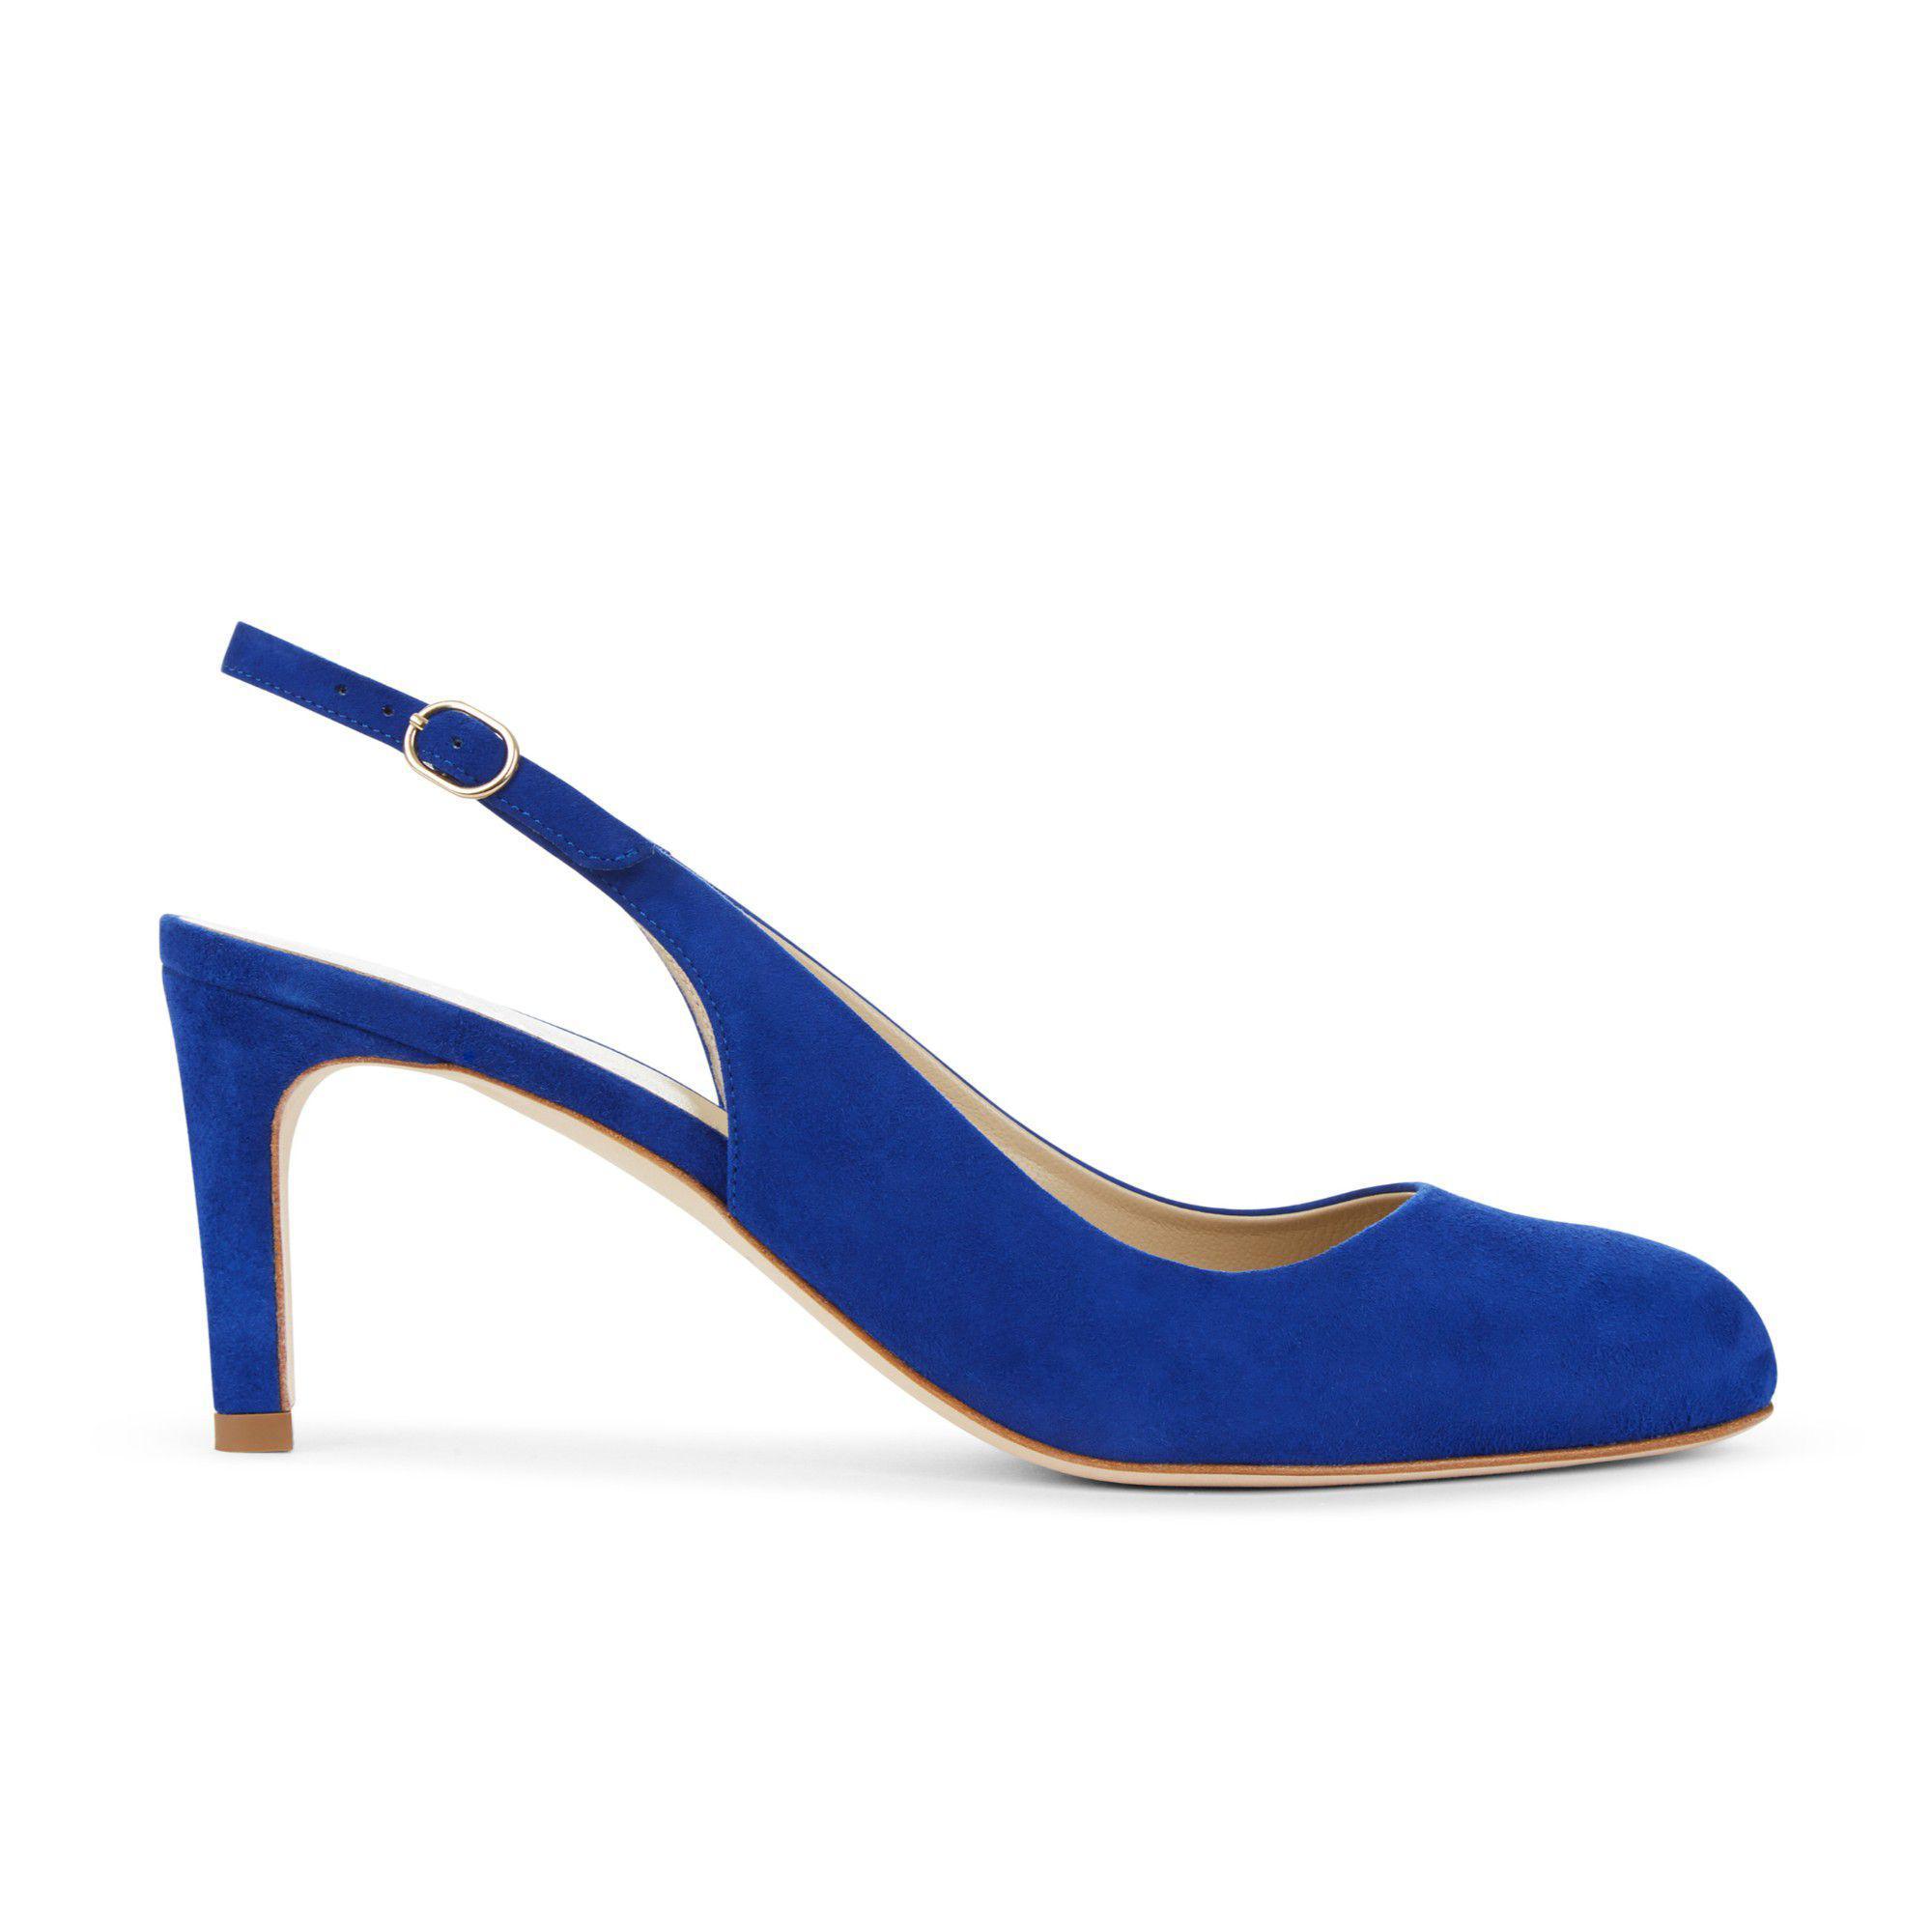 732feb837c234 Hobbs Bright Blue 'sophia' Slingback - Lyst